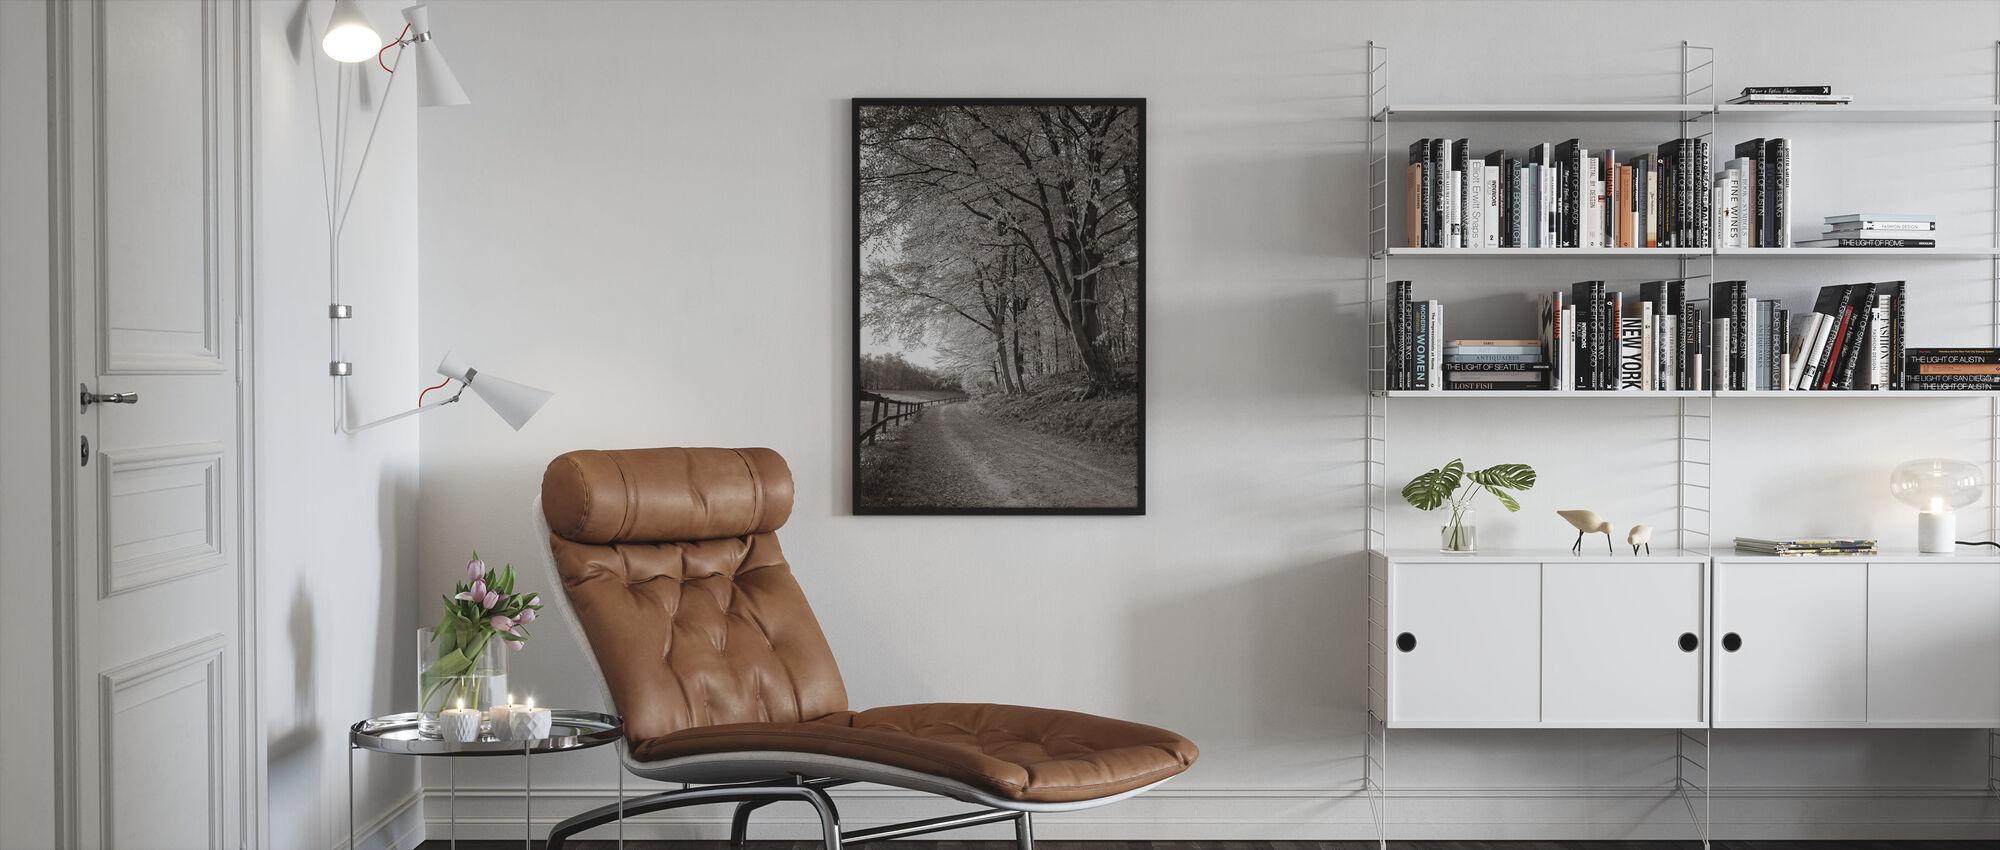 Country Road - Framed print - Living Room